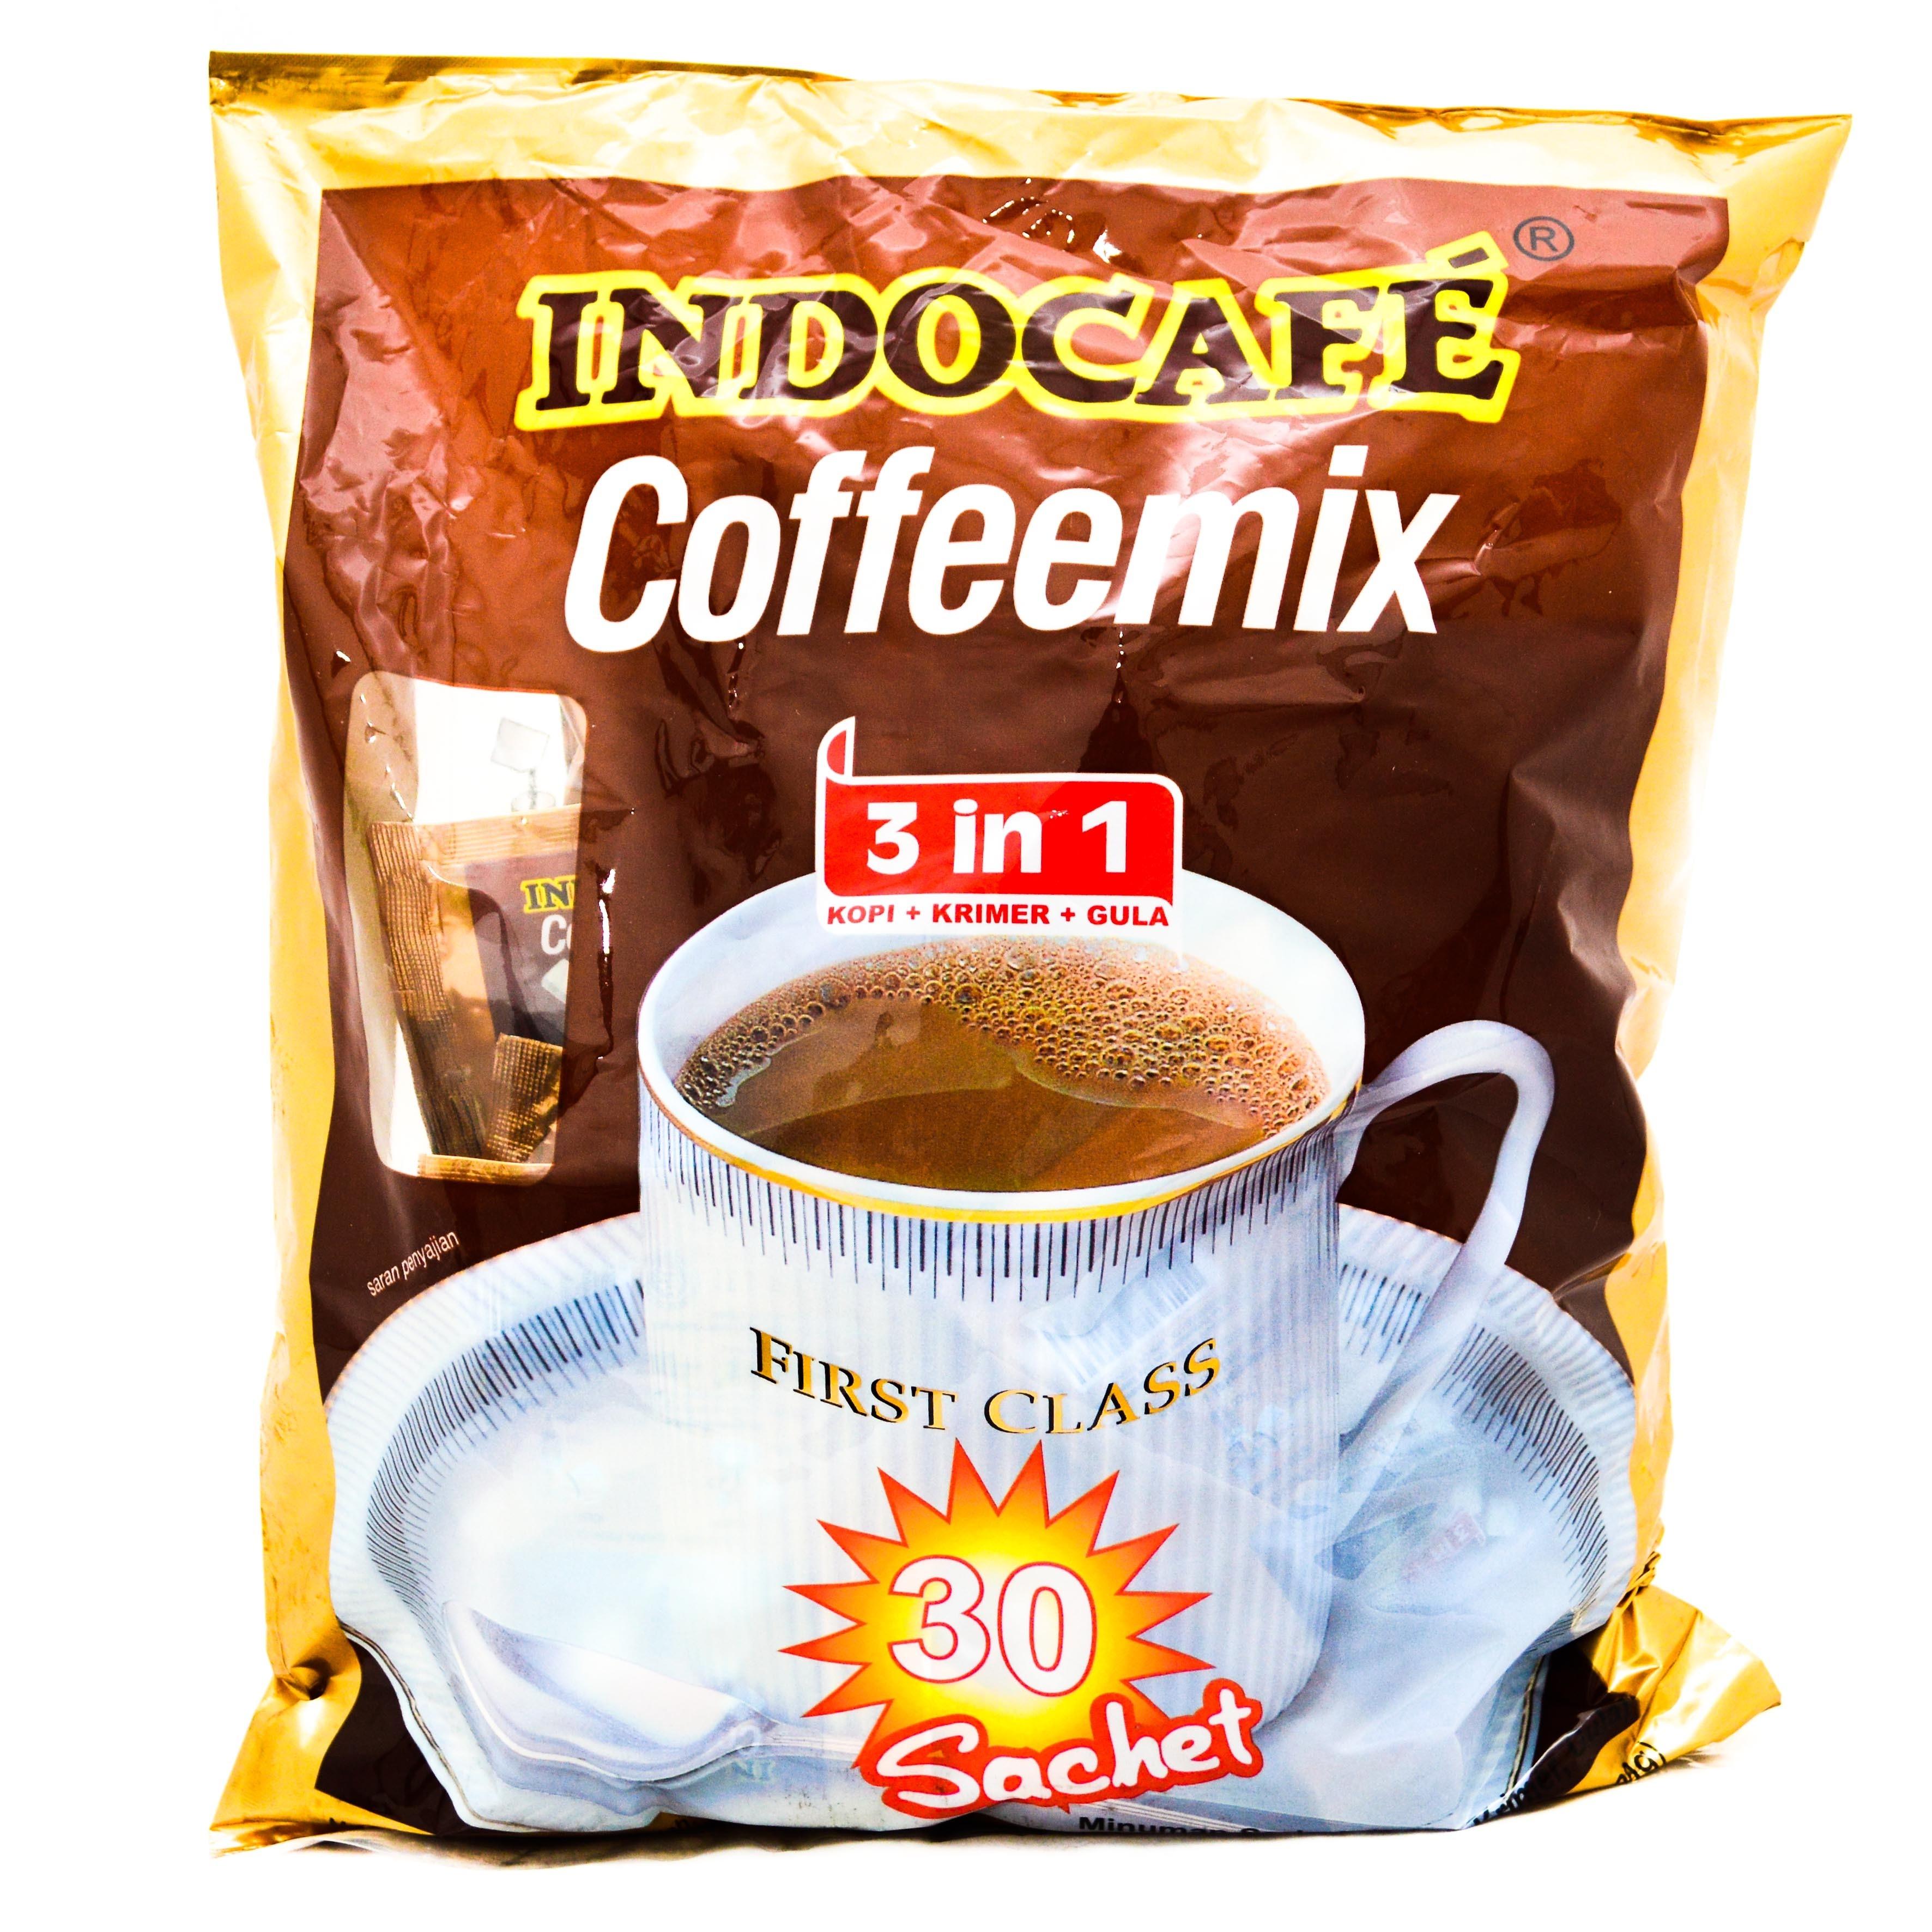 INDOCAFE COFFEMIX 30X20G